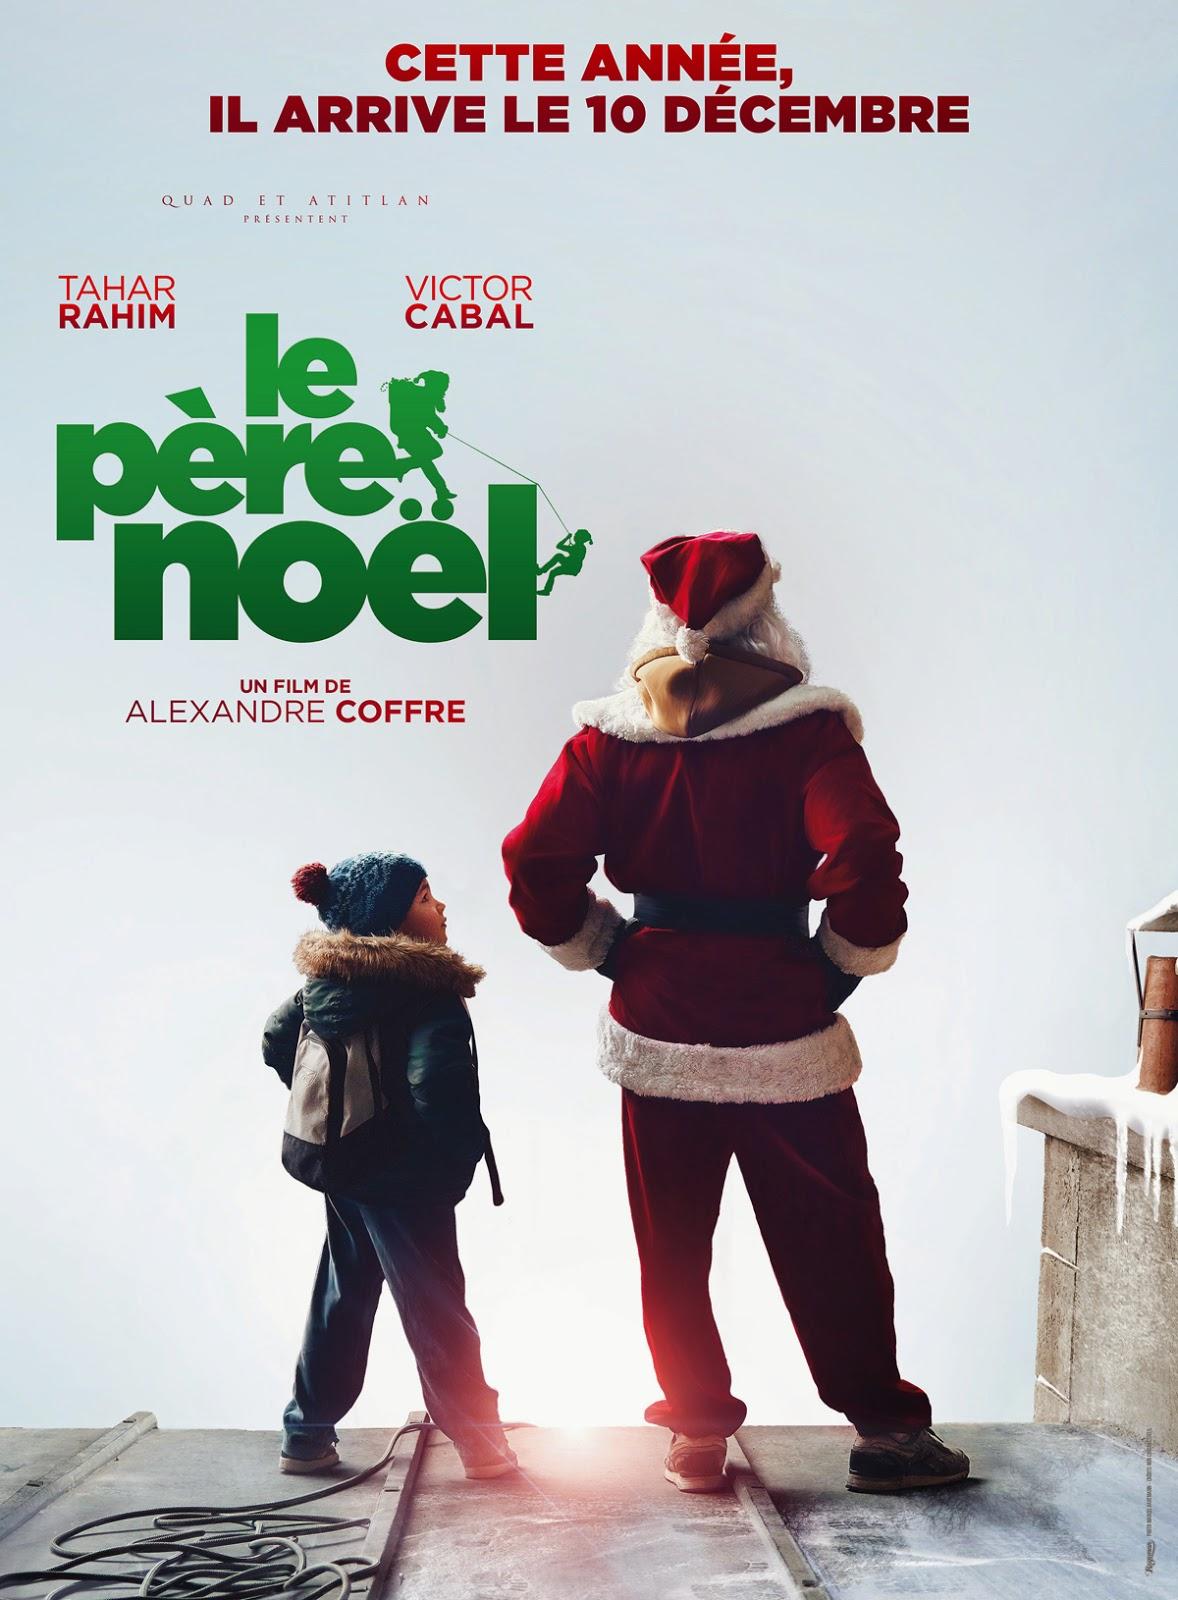 http://fuckingcinephiles.blogspot.fr/2014/12/critique-le-pere-noel.html